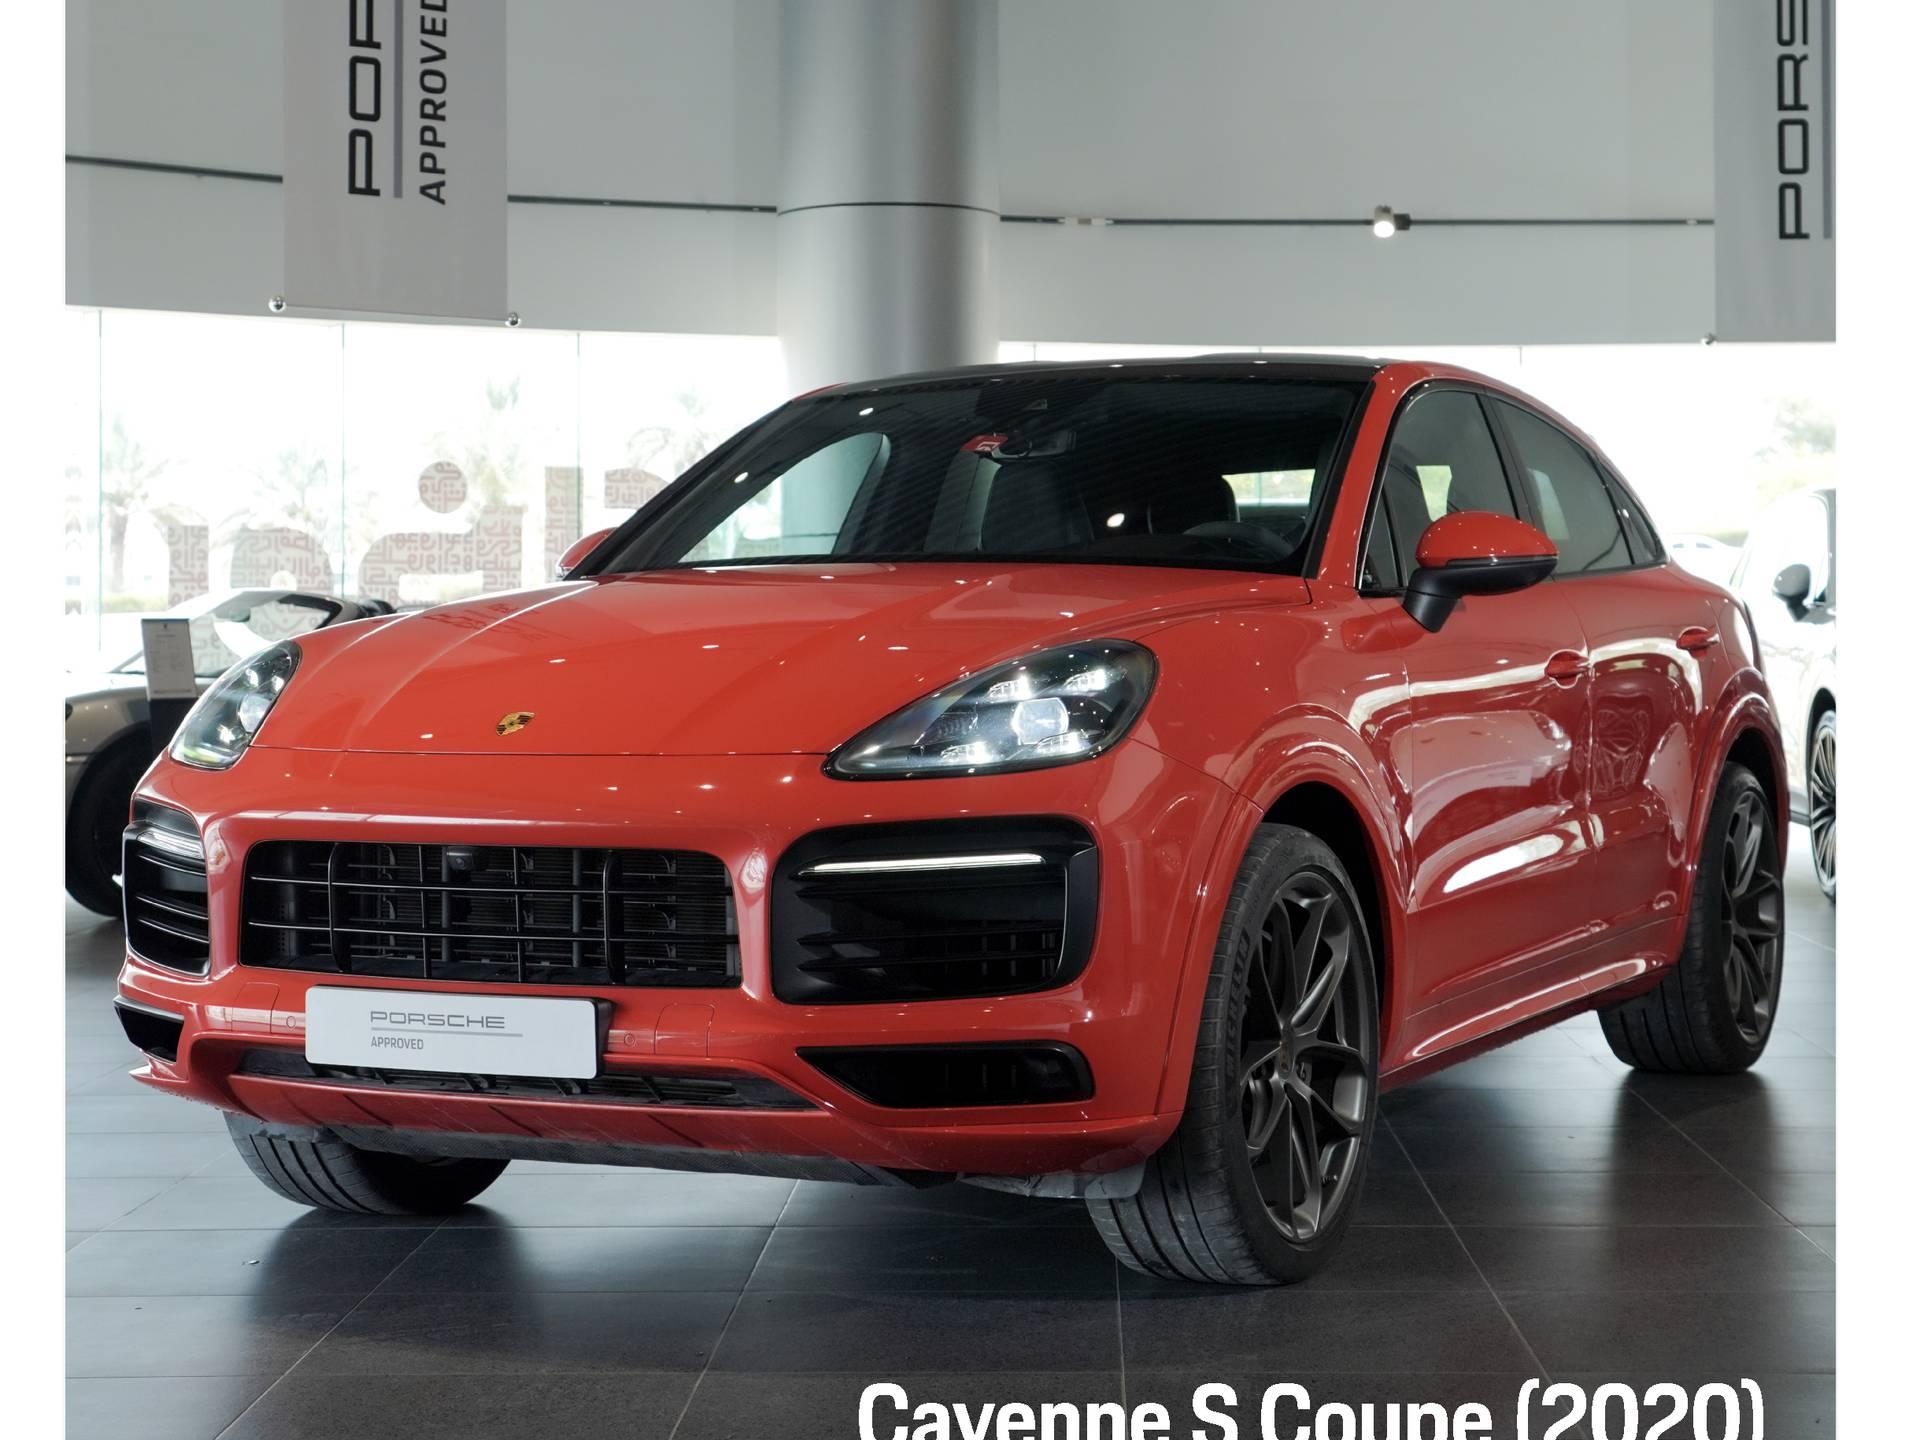 2020 Porsche Cayenne S Coupé – 1